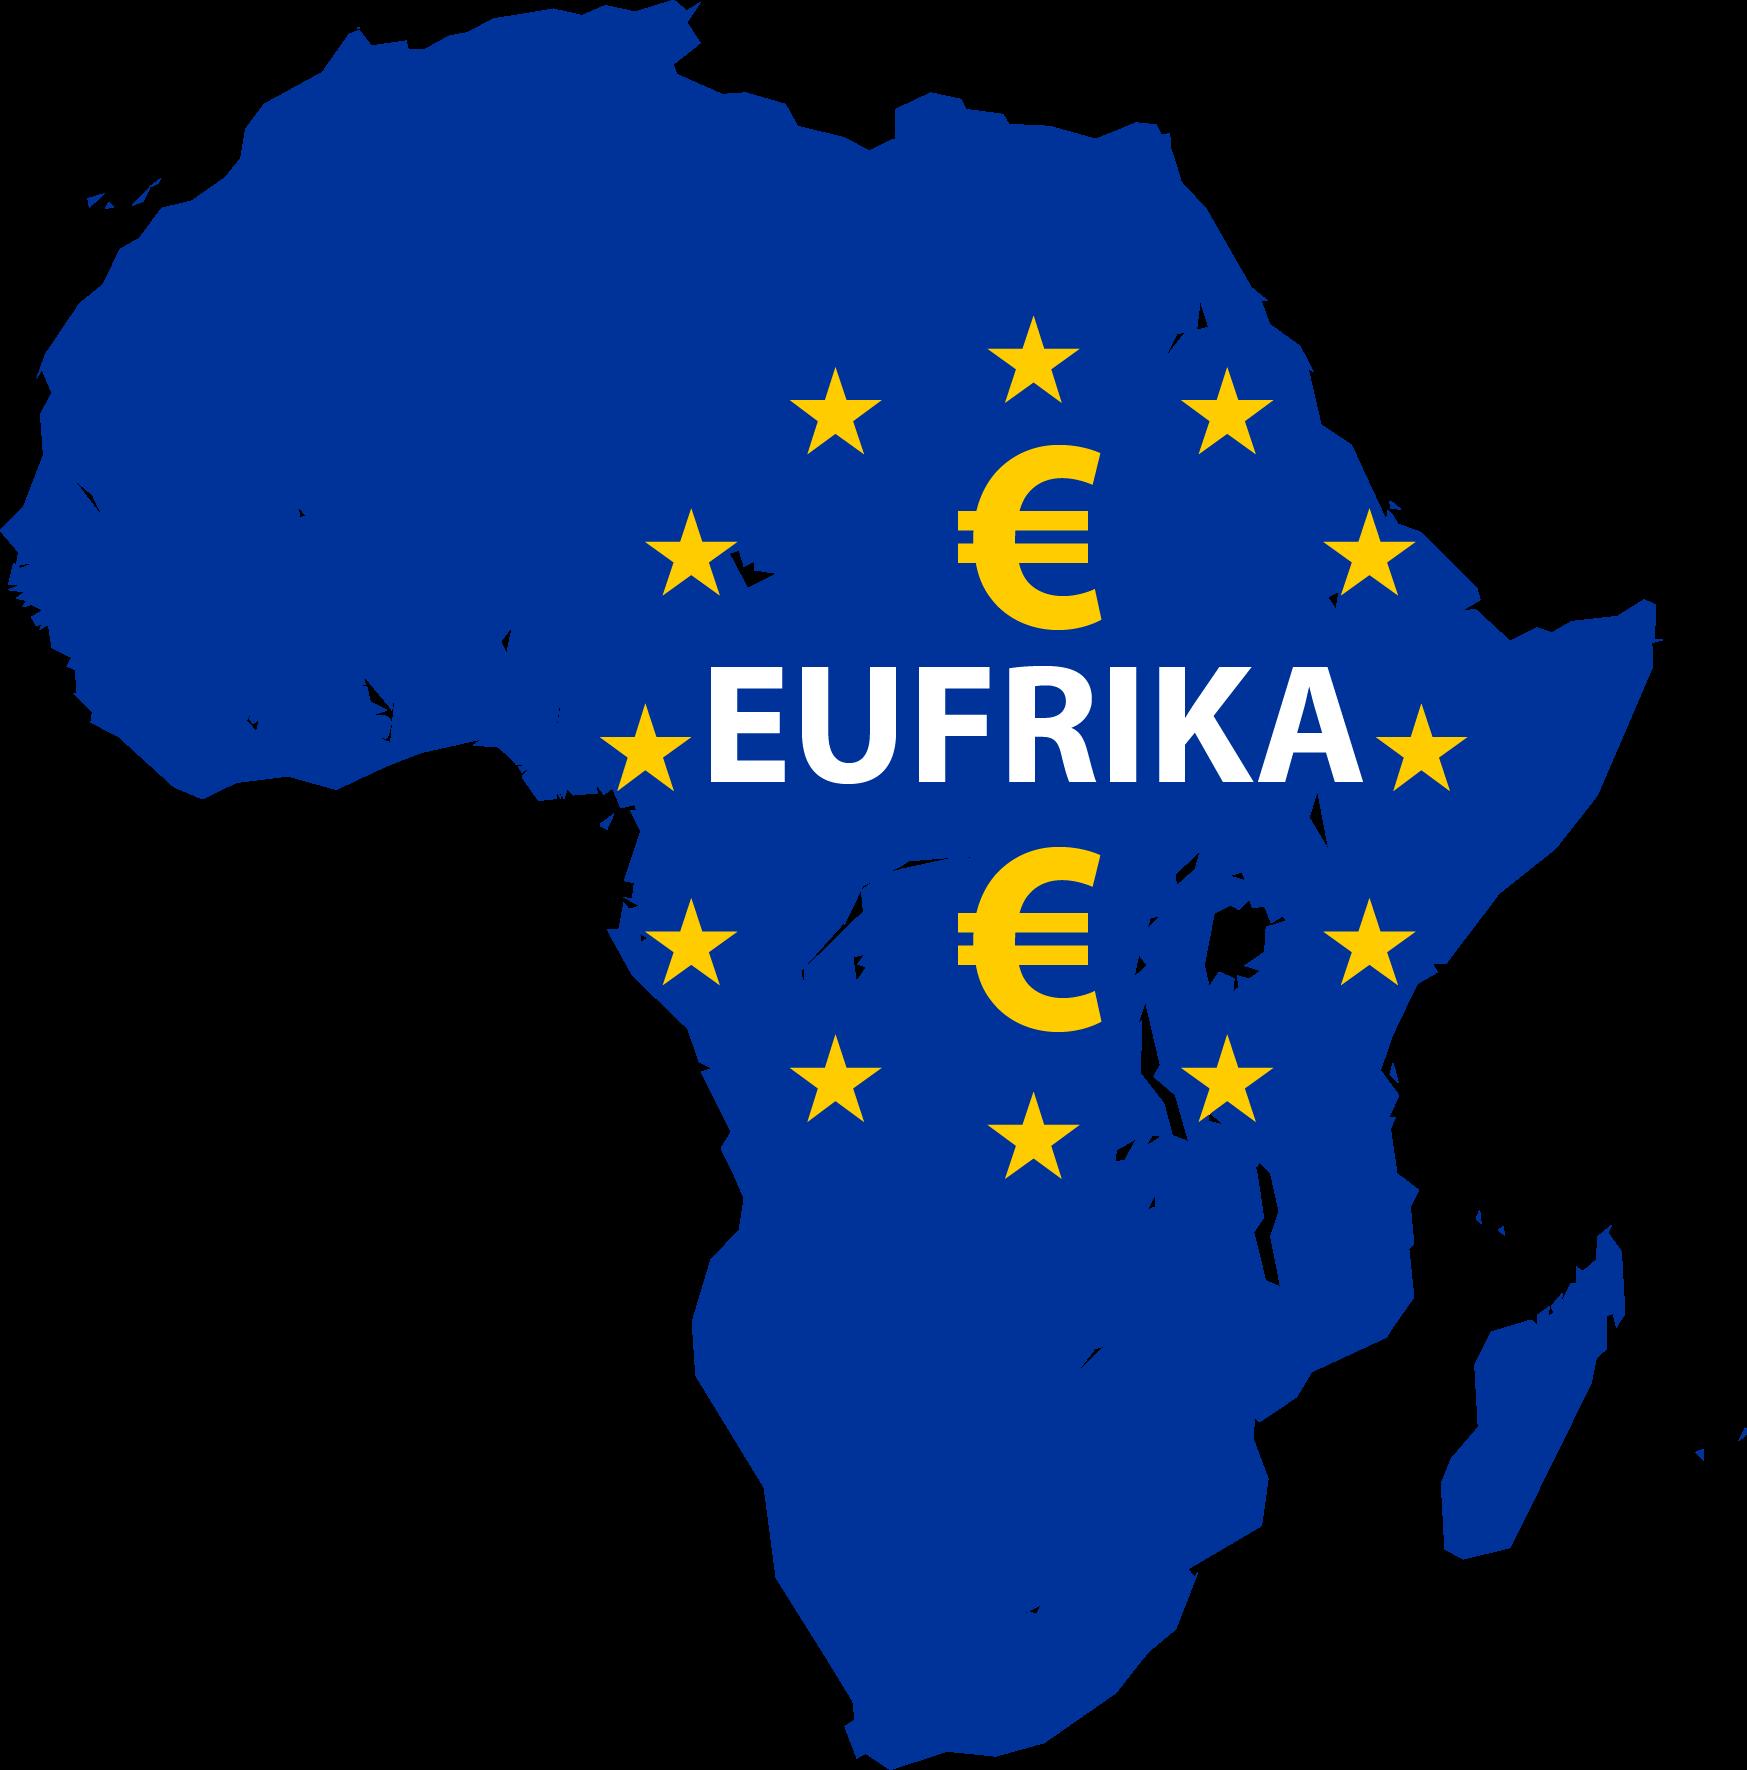 EUFRIKA_Cartography_of_Africa_Afrika_Europa_EU_Kontinent_silouette_Landkarte_Symbol